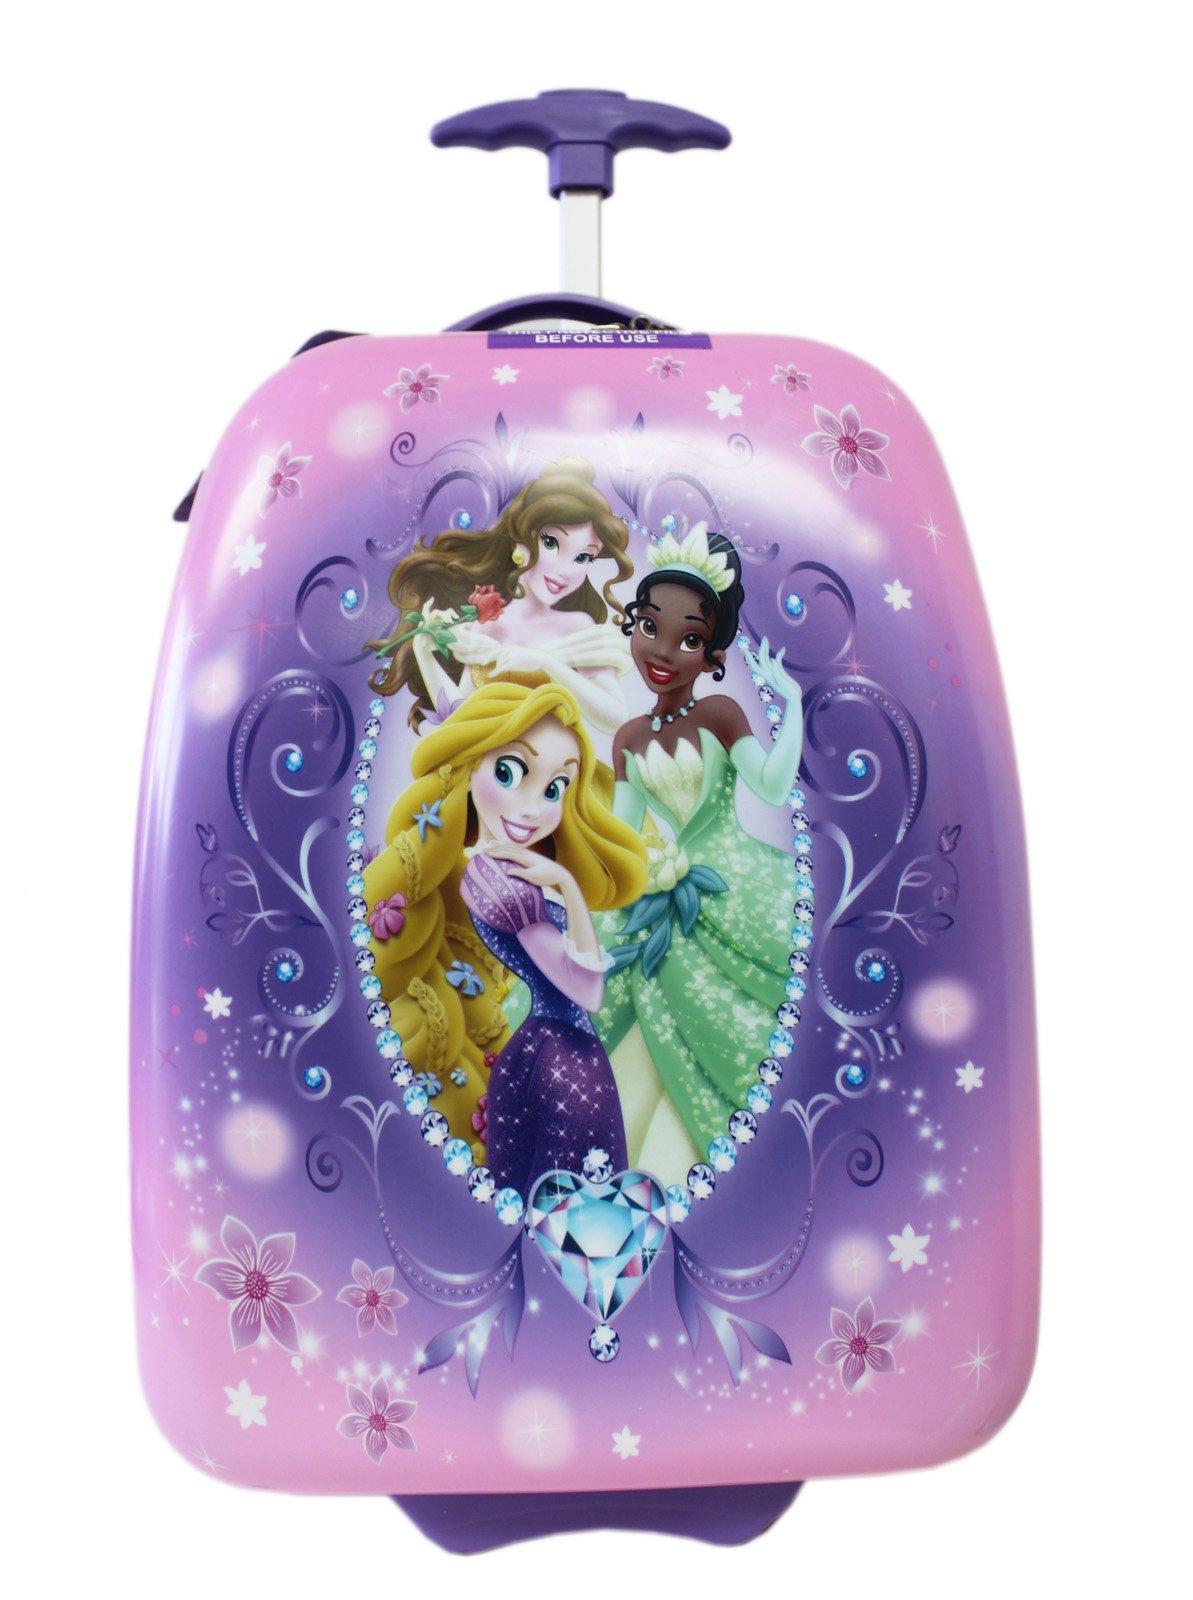 Disney Princess Tiana, Rapunzel, and Belle Pink/Lavender Kids Luggage (16in)